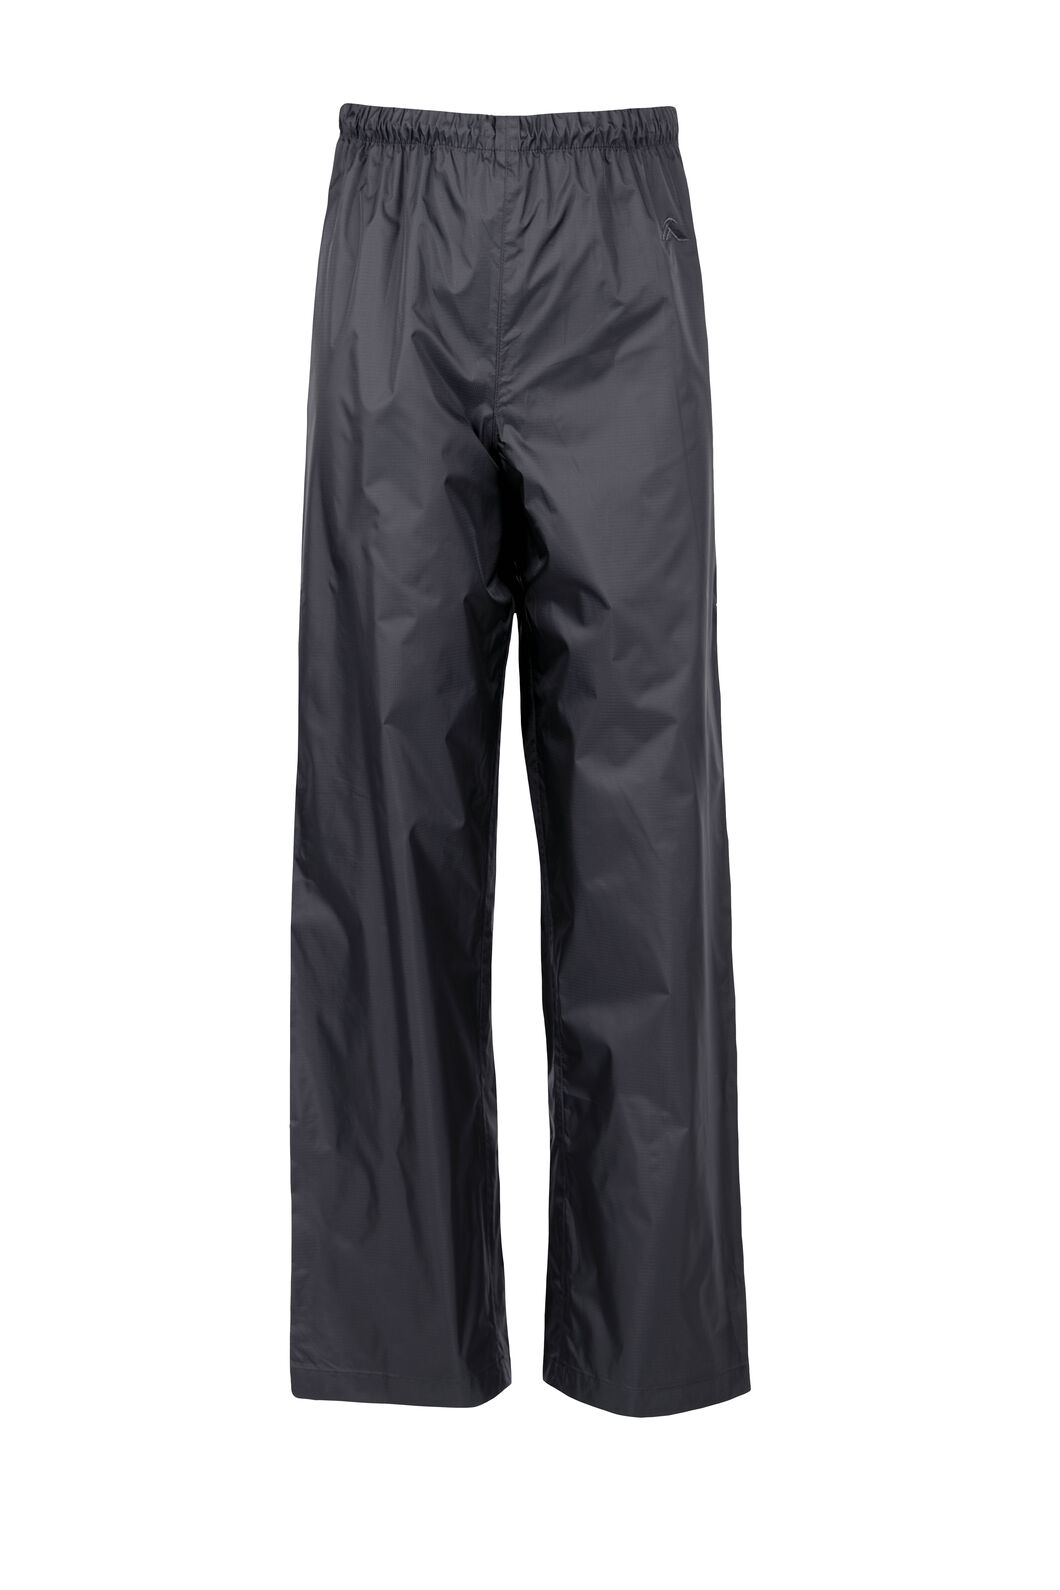 Macpac Jetstream Reflex™ Rain Pants — Women's, Black, hi-res